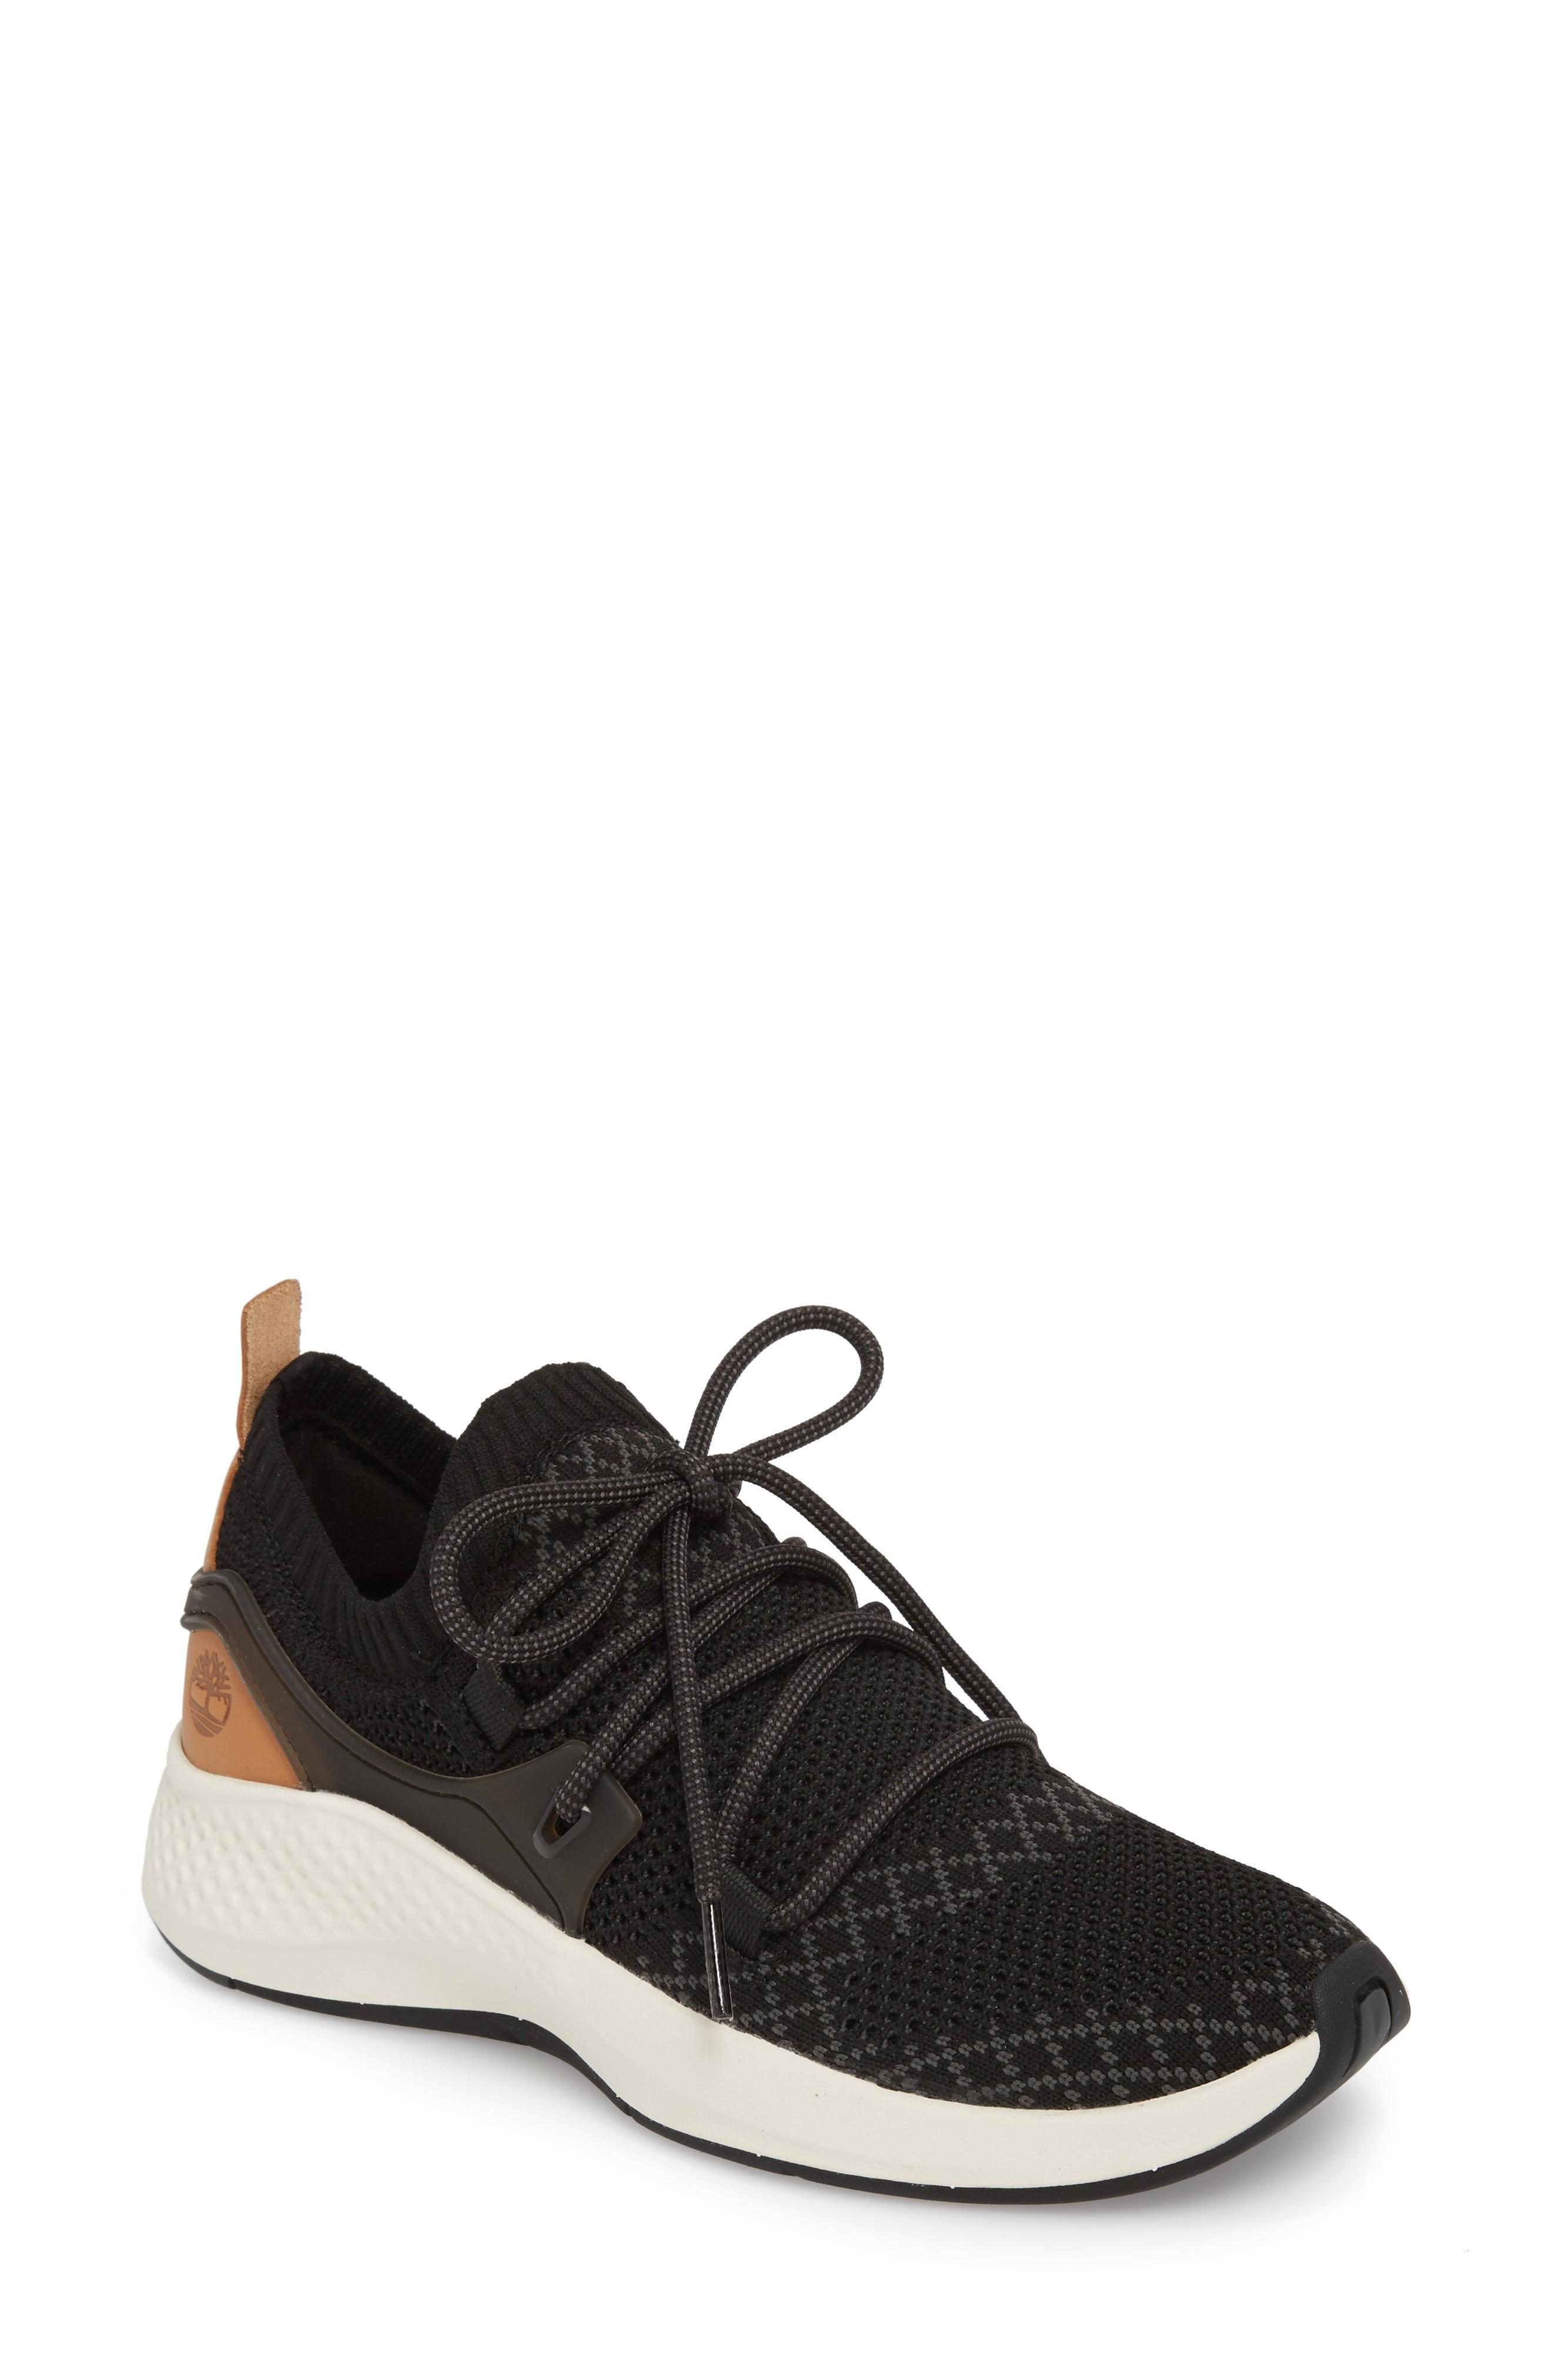 Timberland Flyroam Go Knit Sneaker In Black Fabric